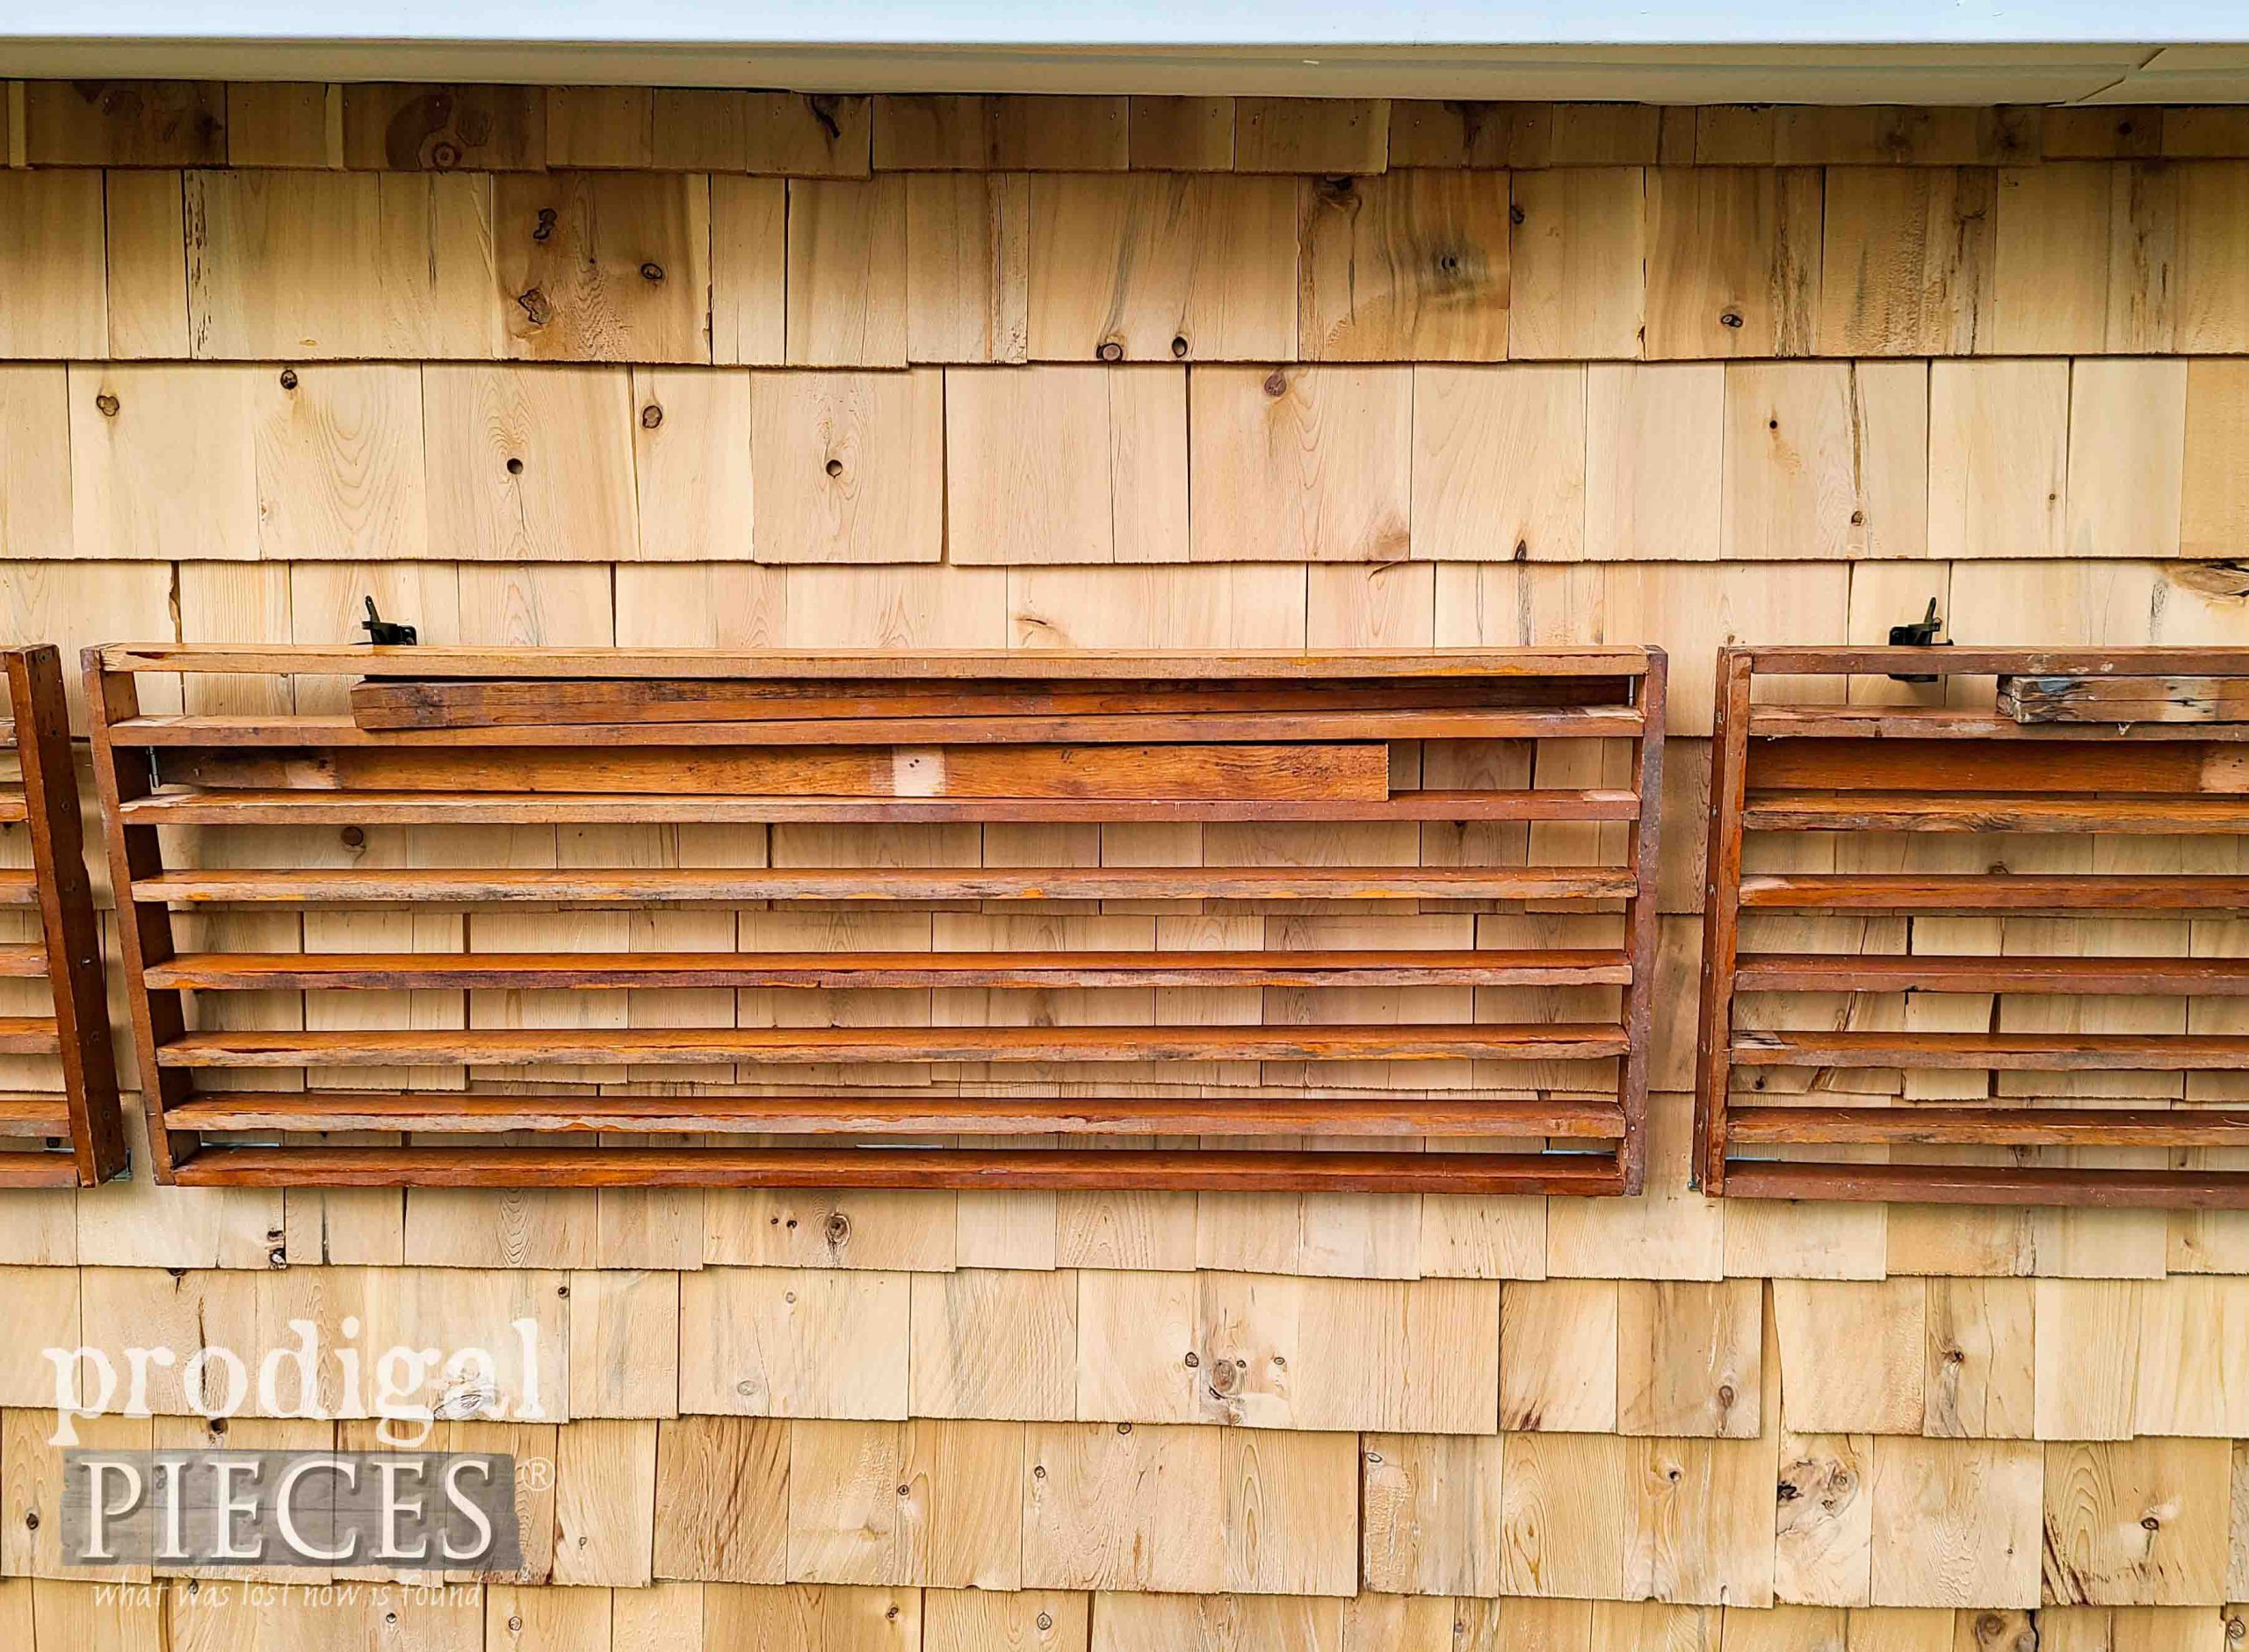 Potting Bench Folded Closed   prodigalpieces.com